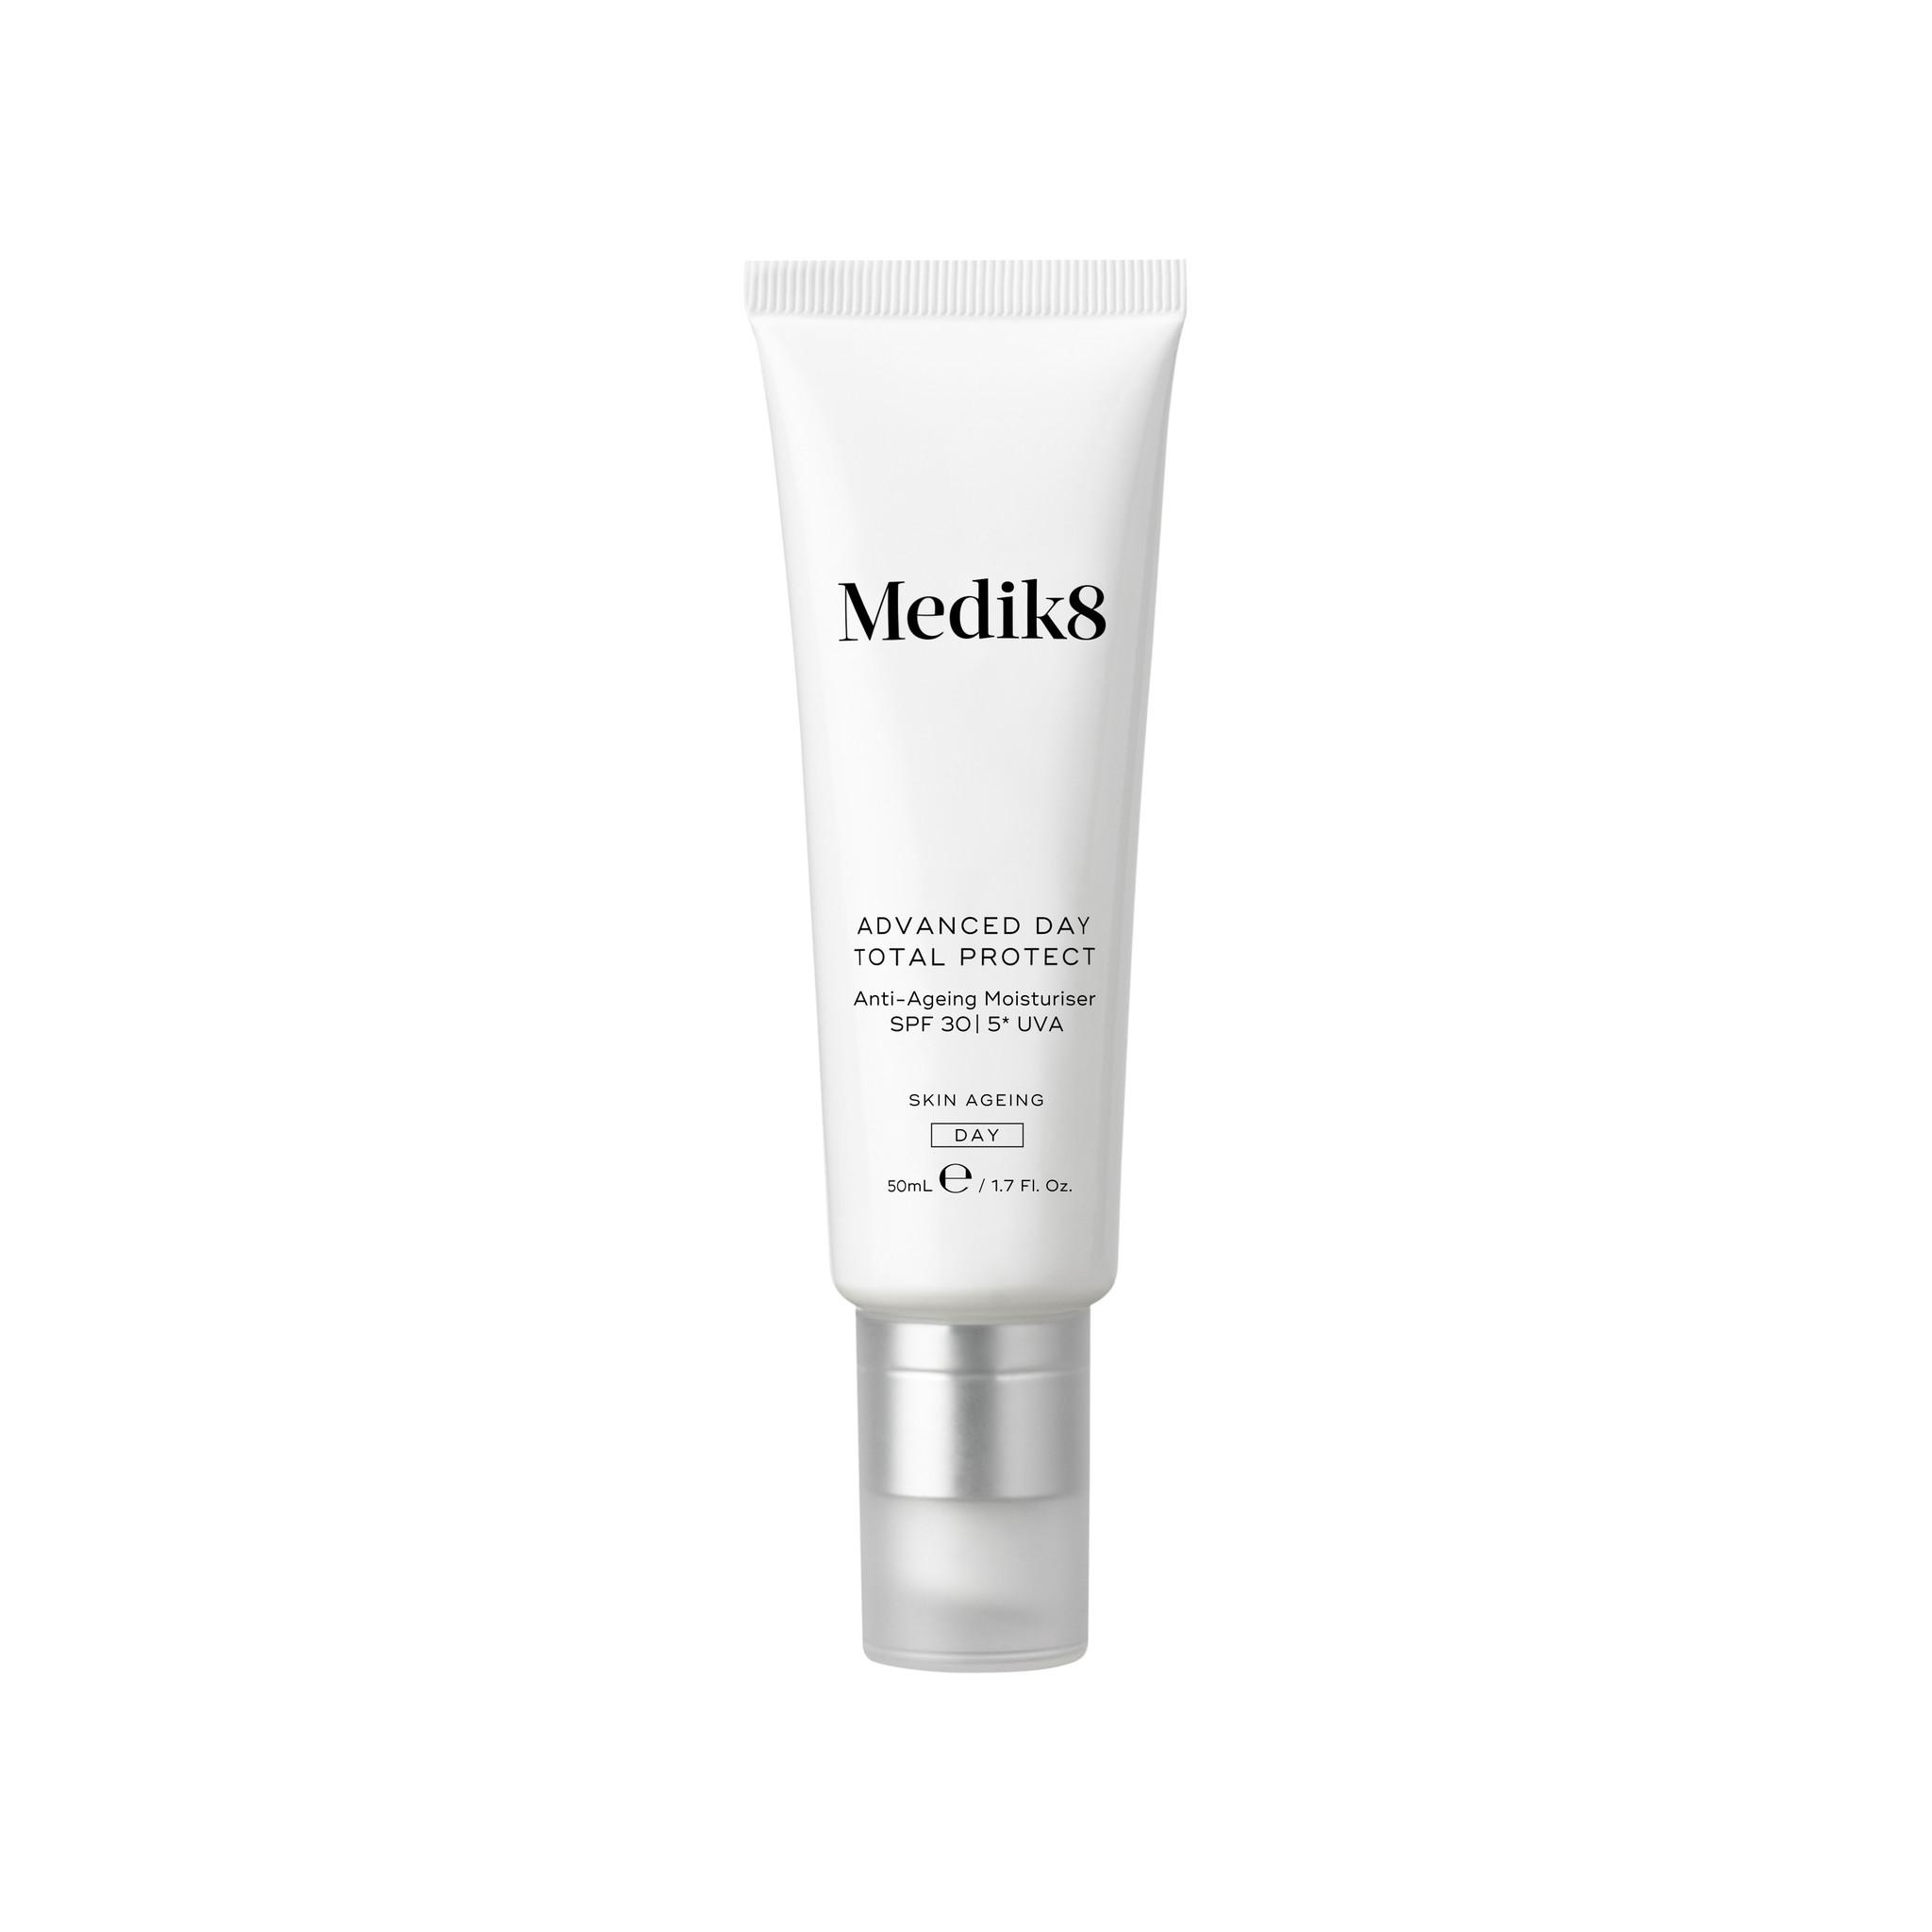 Medik8 Medik8 Try me Size: Advanced Day Total Protect (15 ml)